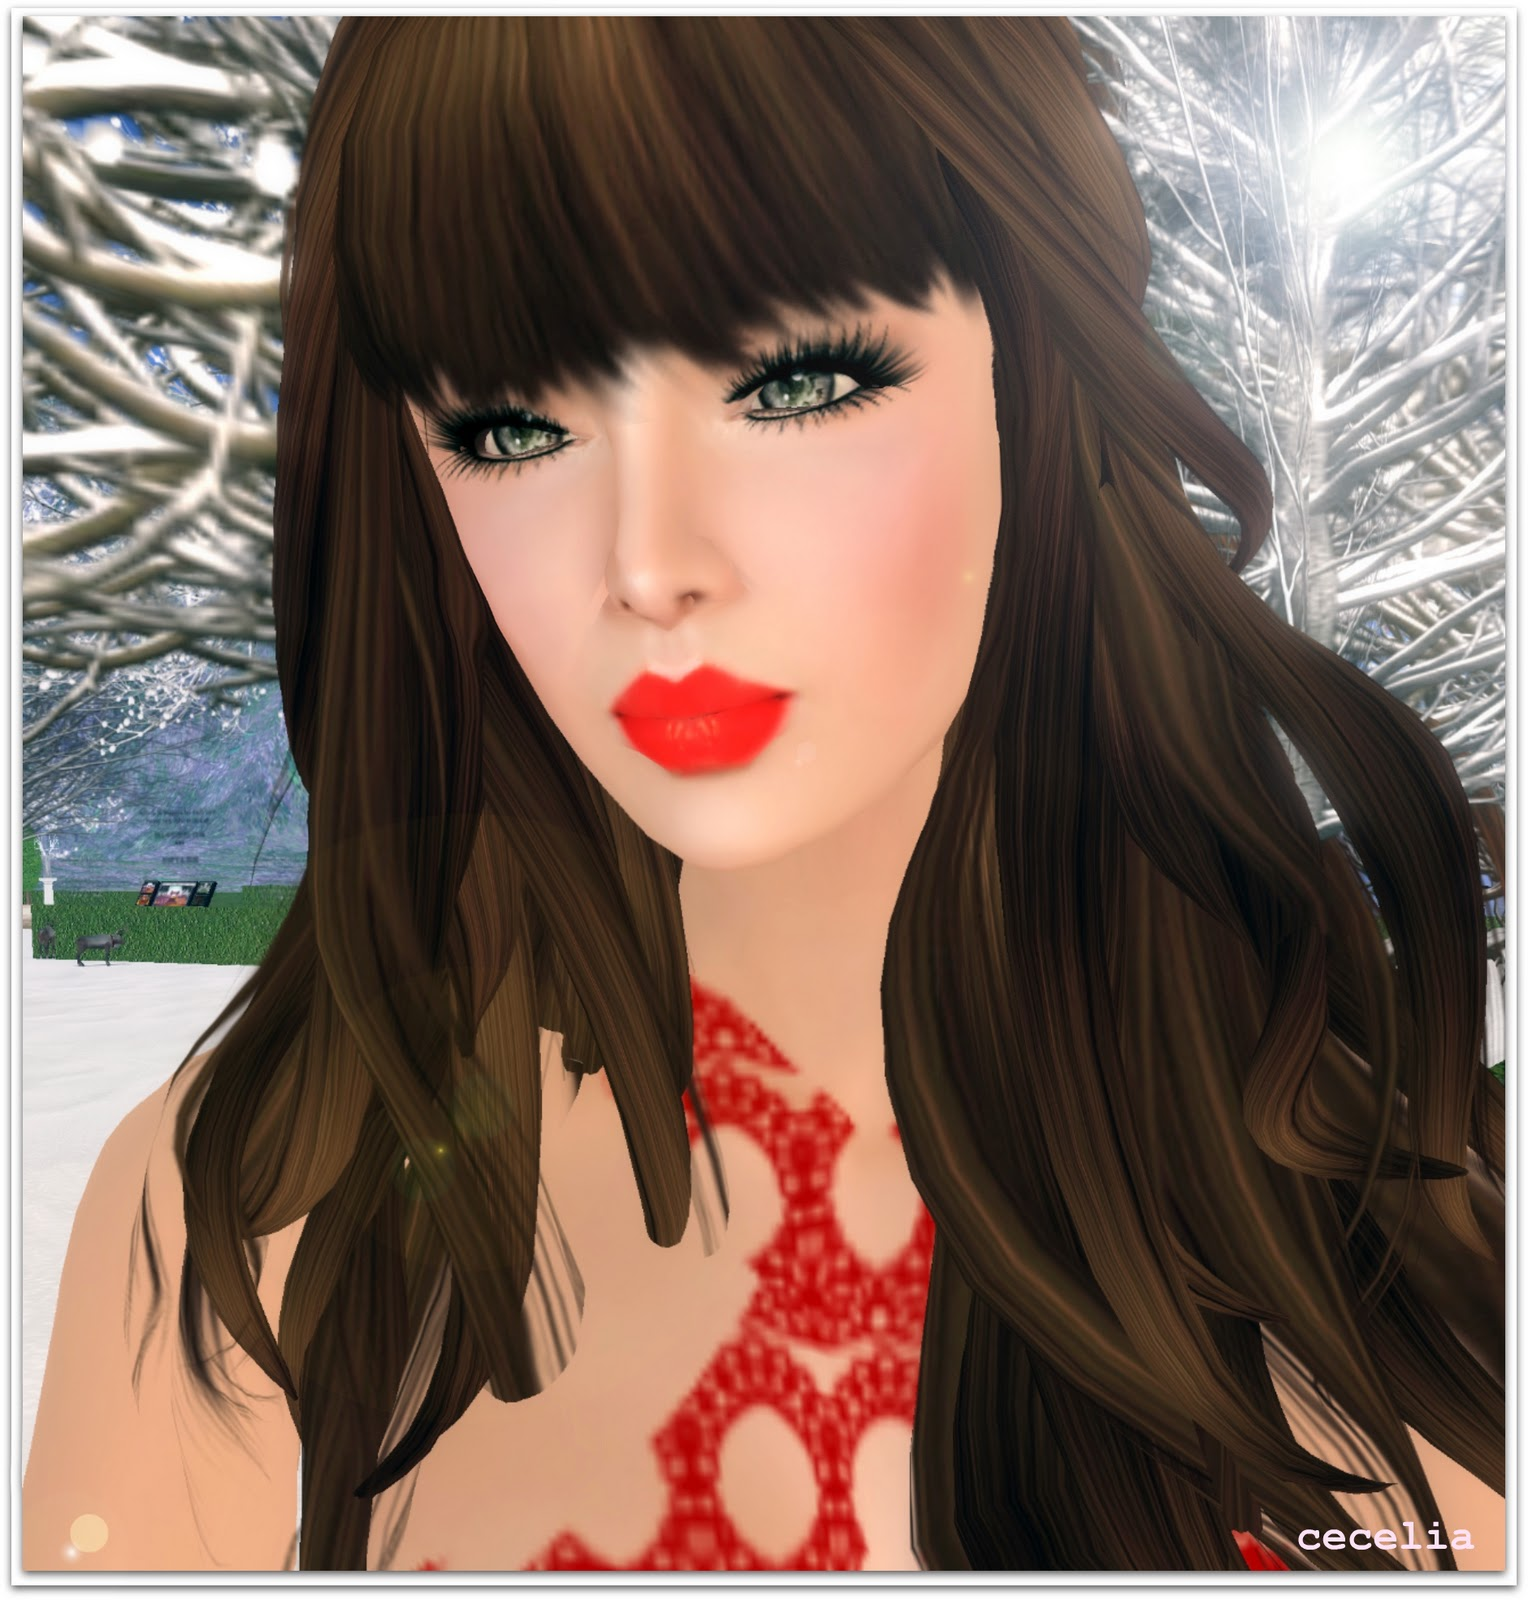 Candydol Sharlotta Images